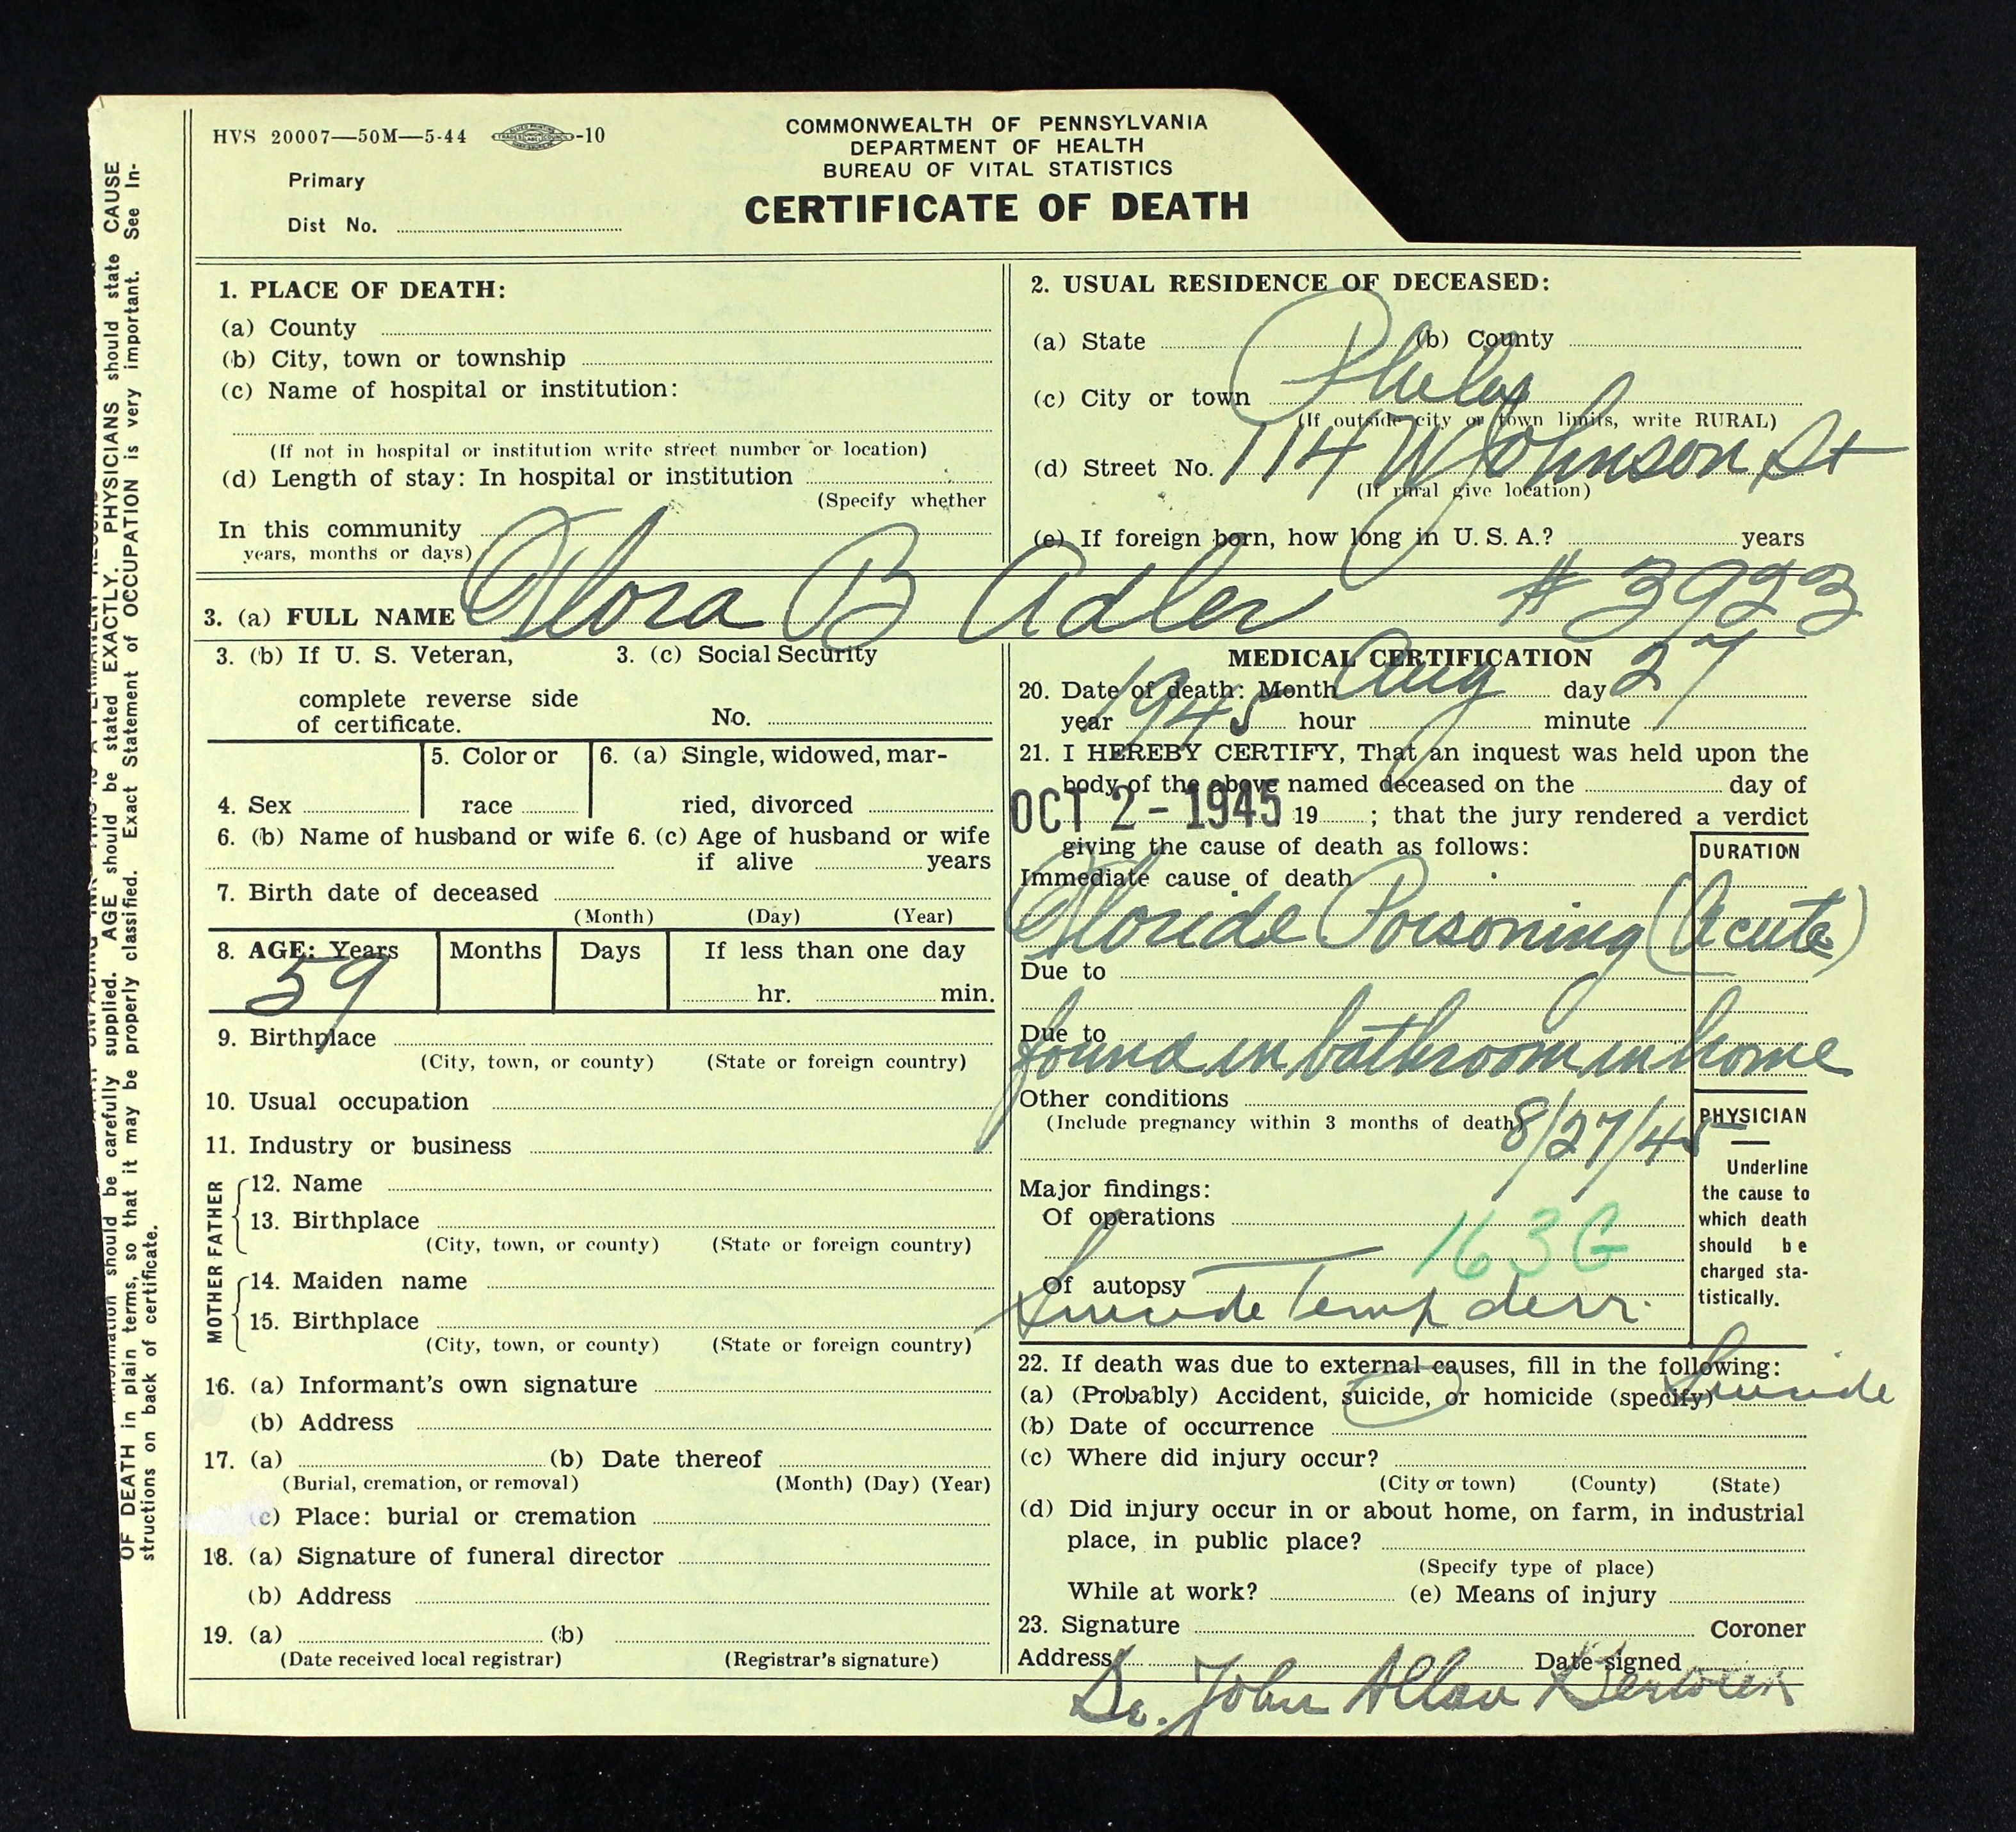 Harrisburg brotmanblog a family journey flora baer death certificate with coroner result xflitez Gallery